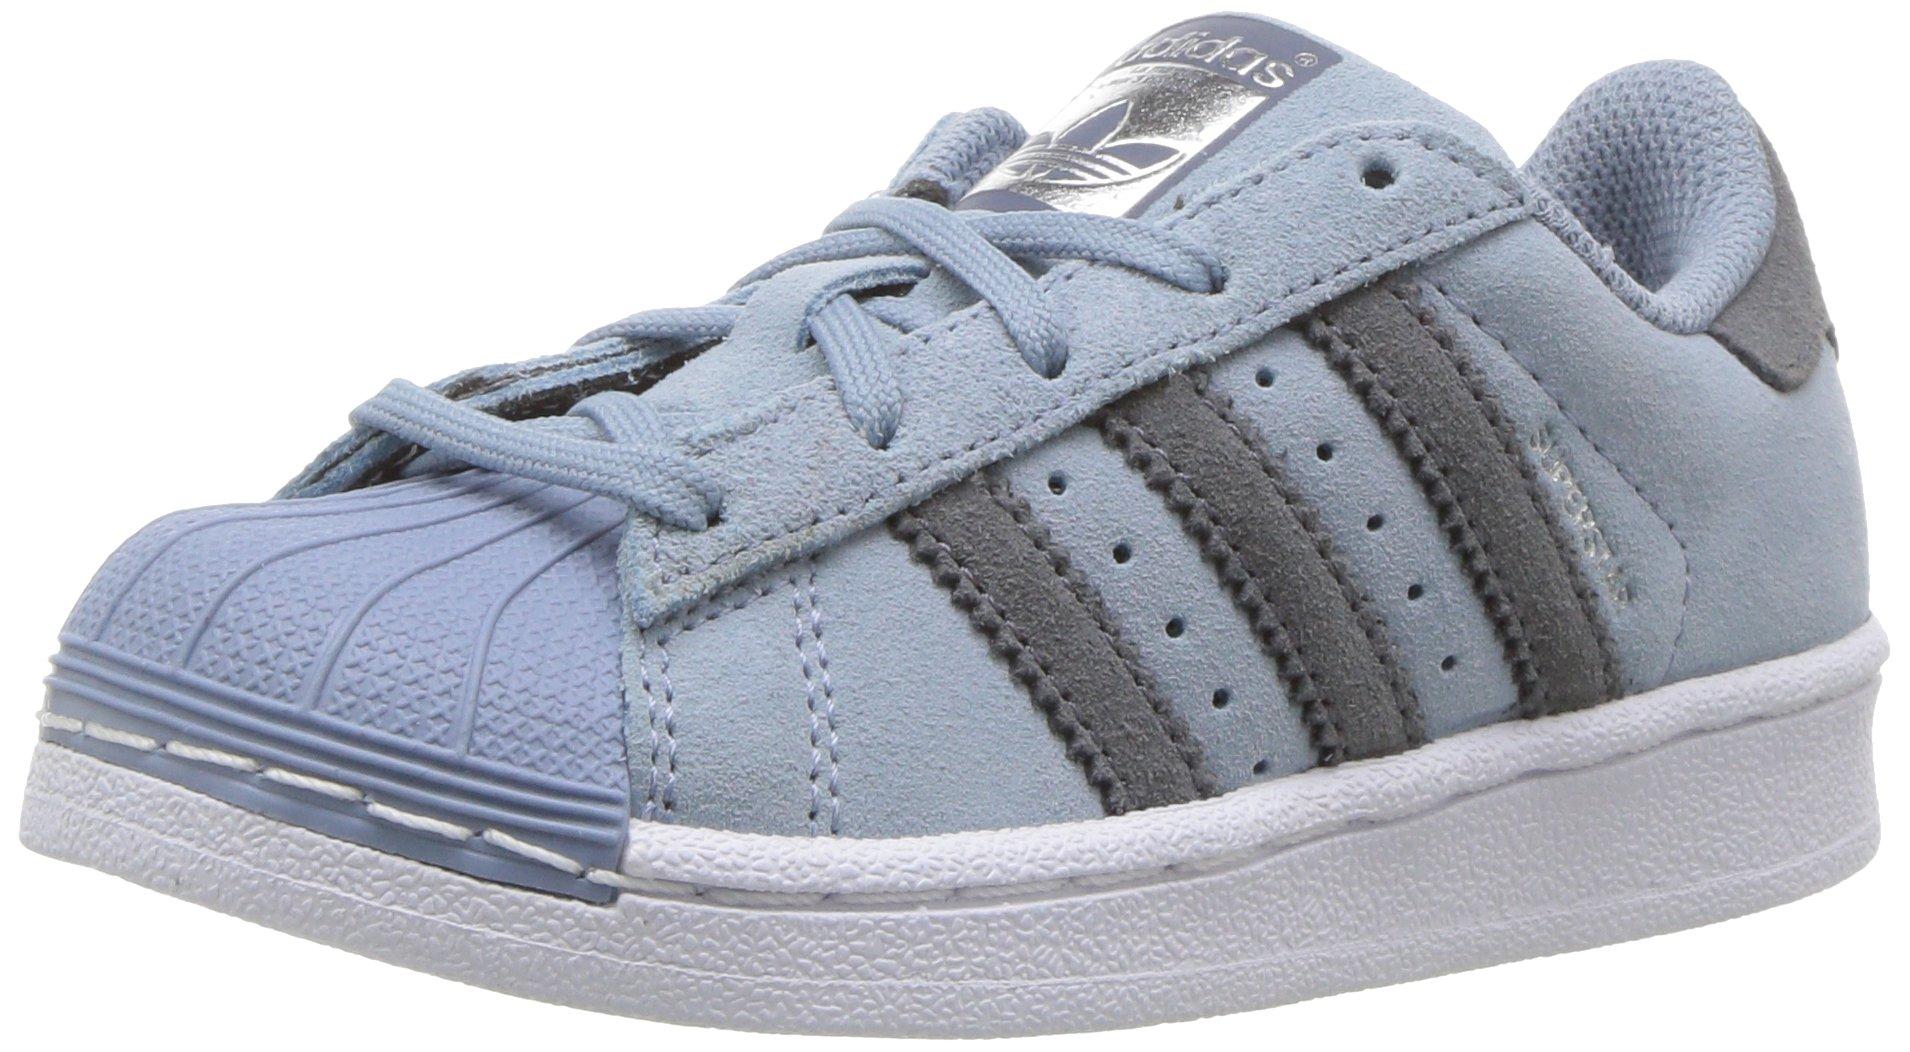 adidas Originals Boys' Superstar C Running Shoe, Tactile Blue Onix, 11 Medium US Little Kid